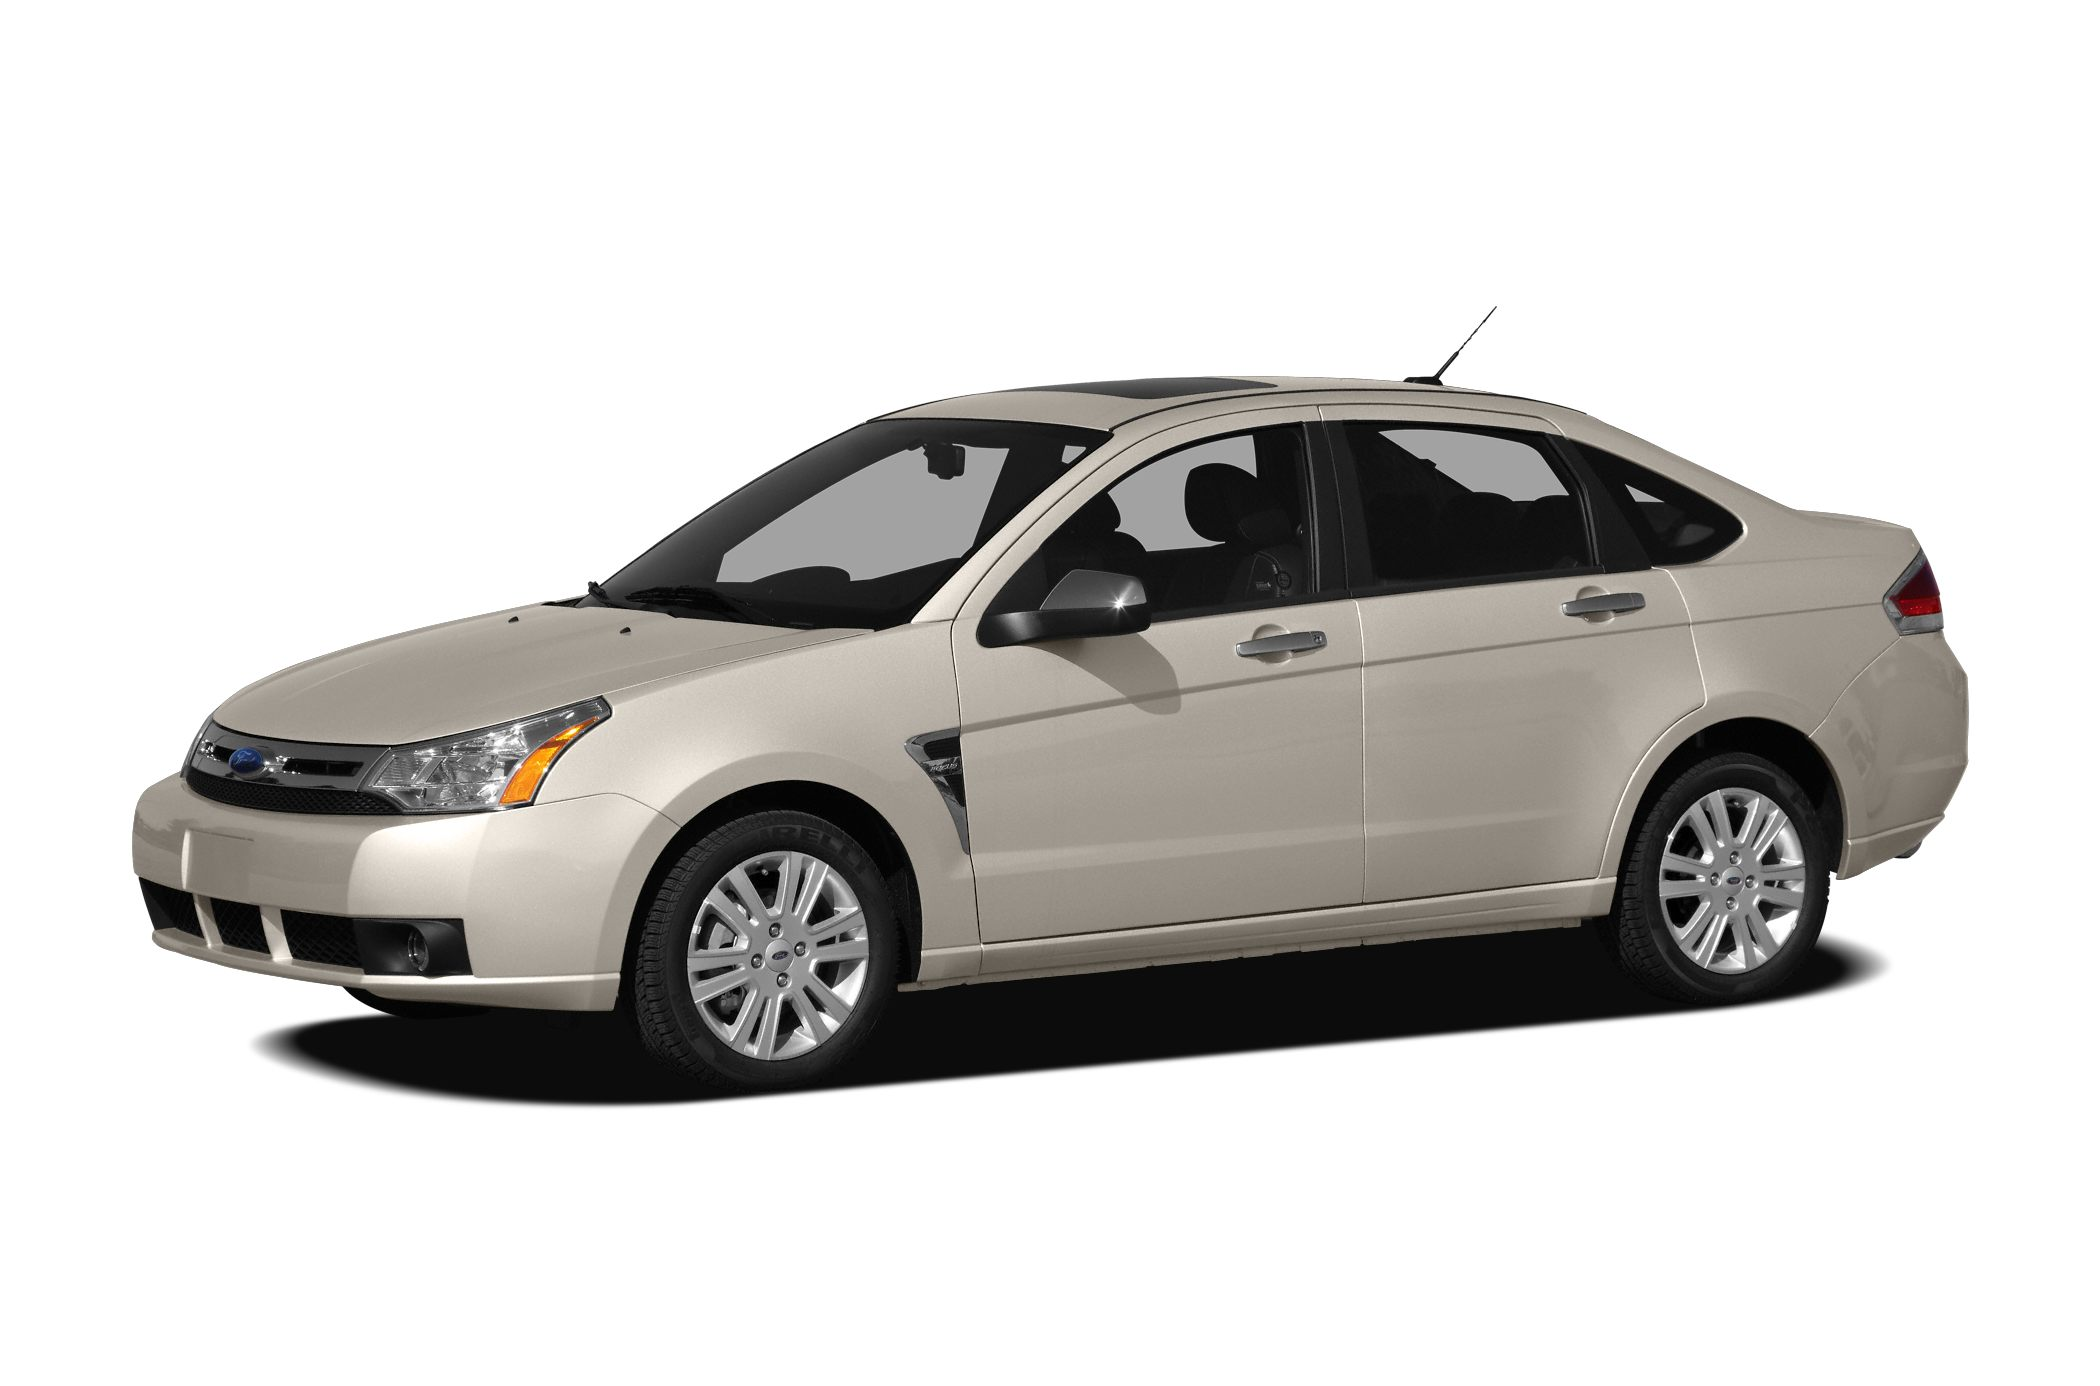 2010 Ford Focus SE Stock s12642ka VIN 1FAHP3FN8AW289958